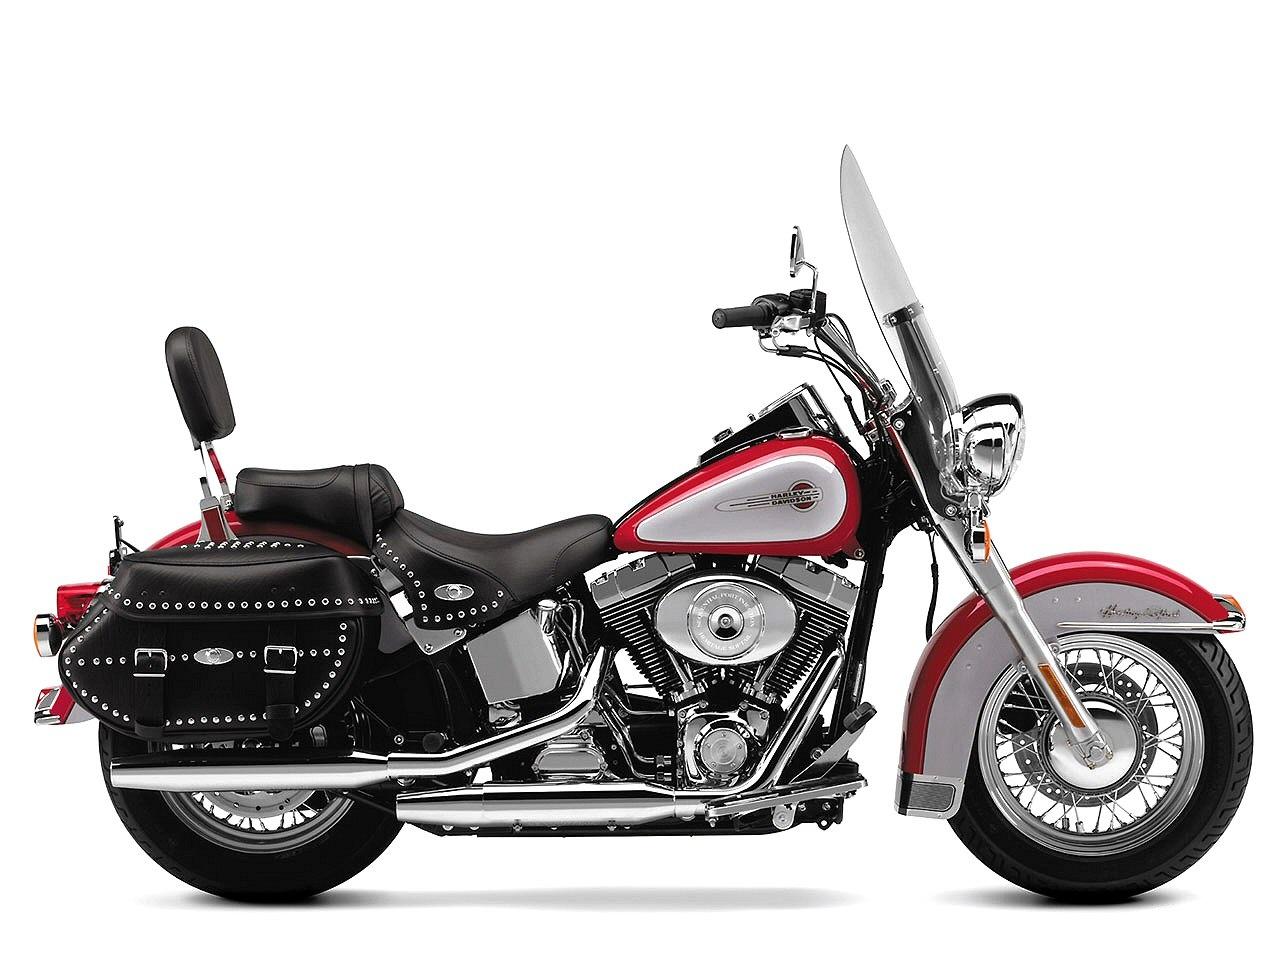 Harley Davidson Sportster 2006 Owners Manual 883 Wiring Diagram Pdf